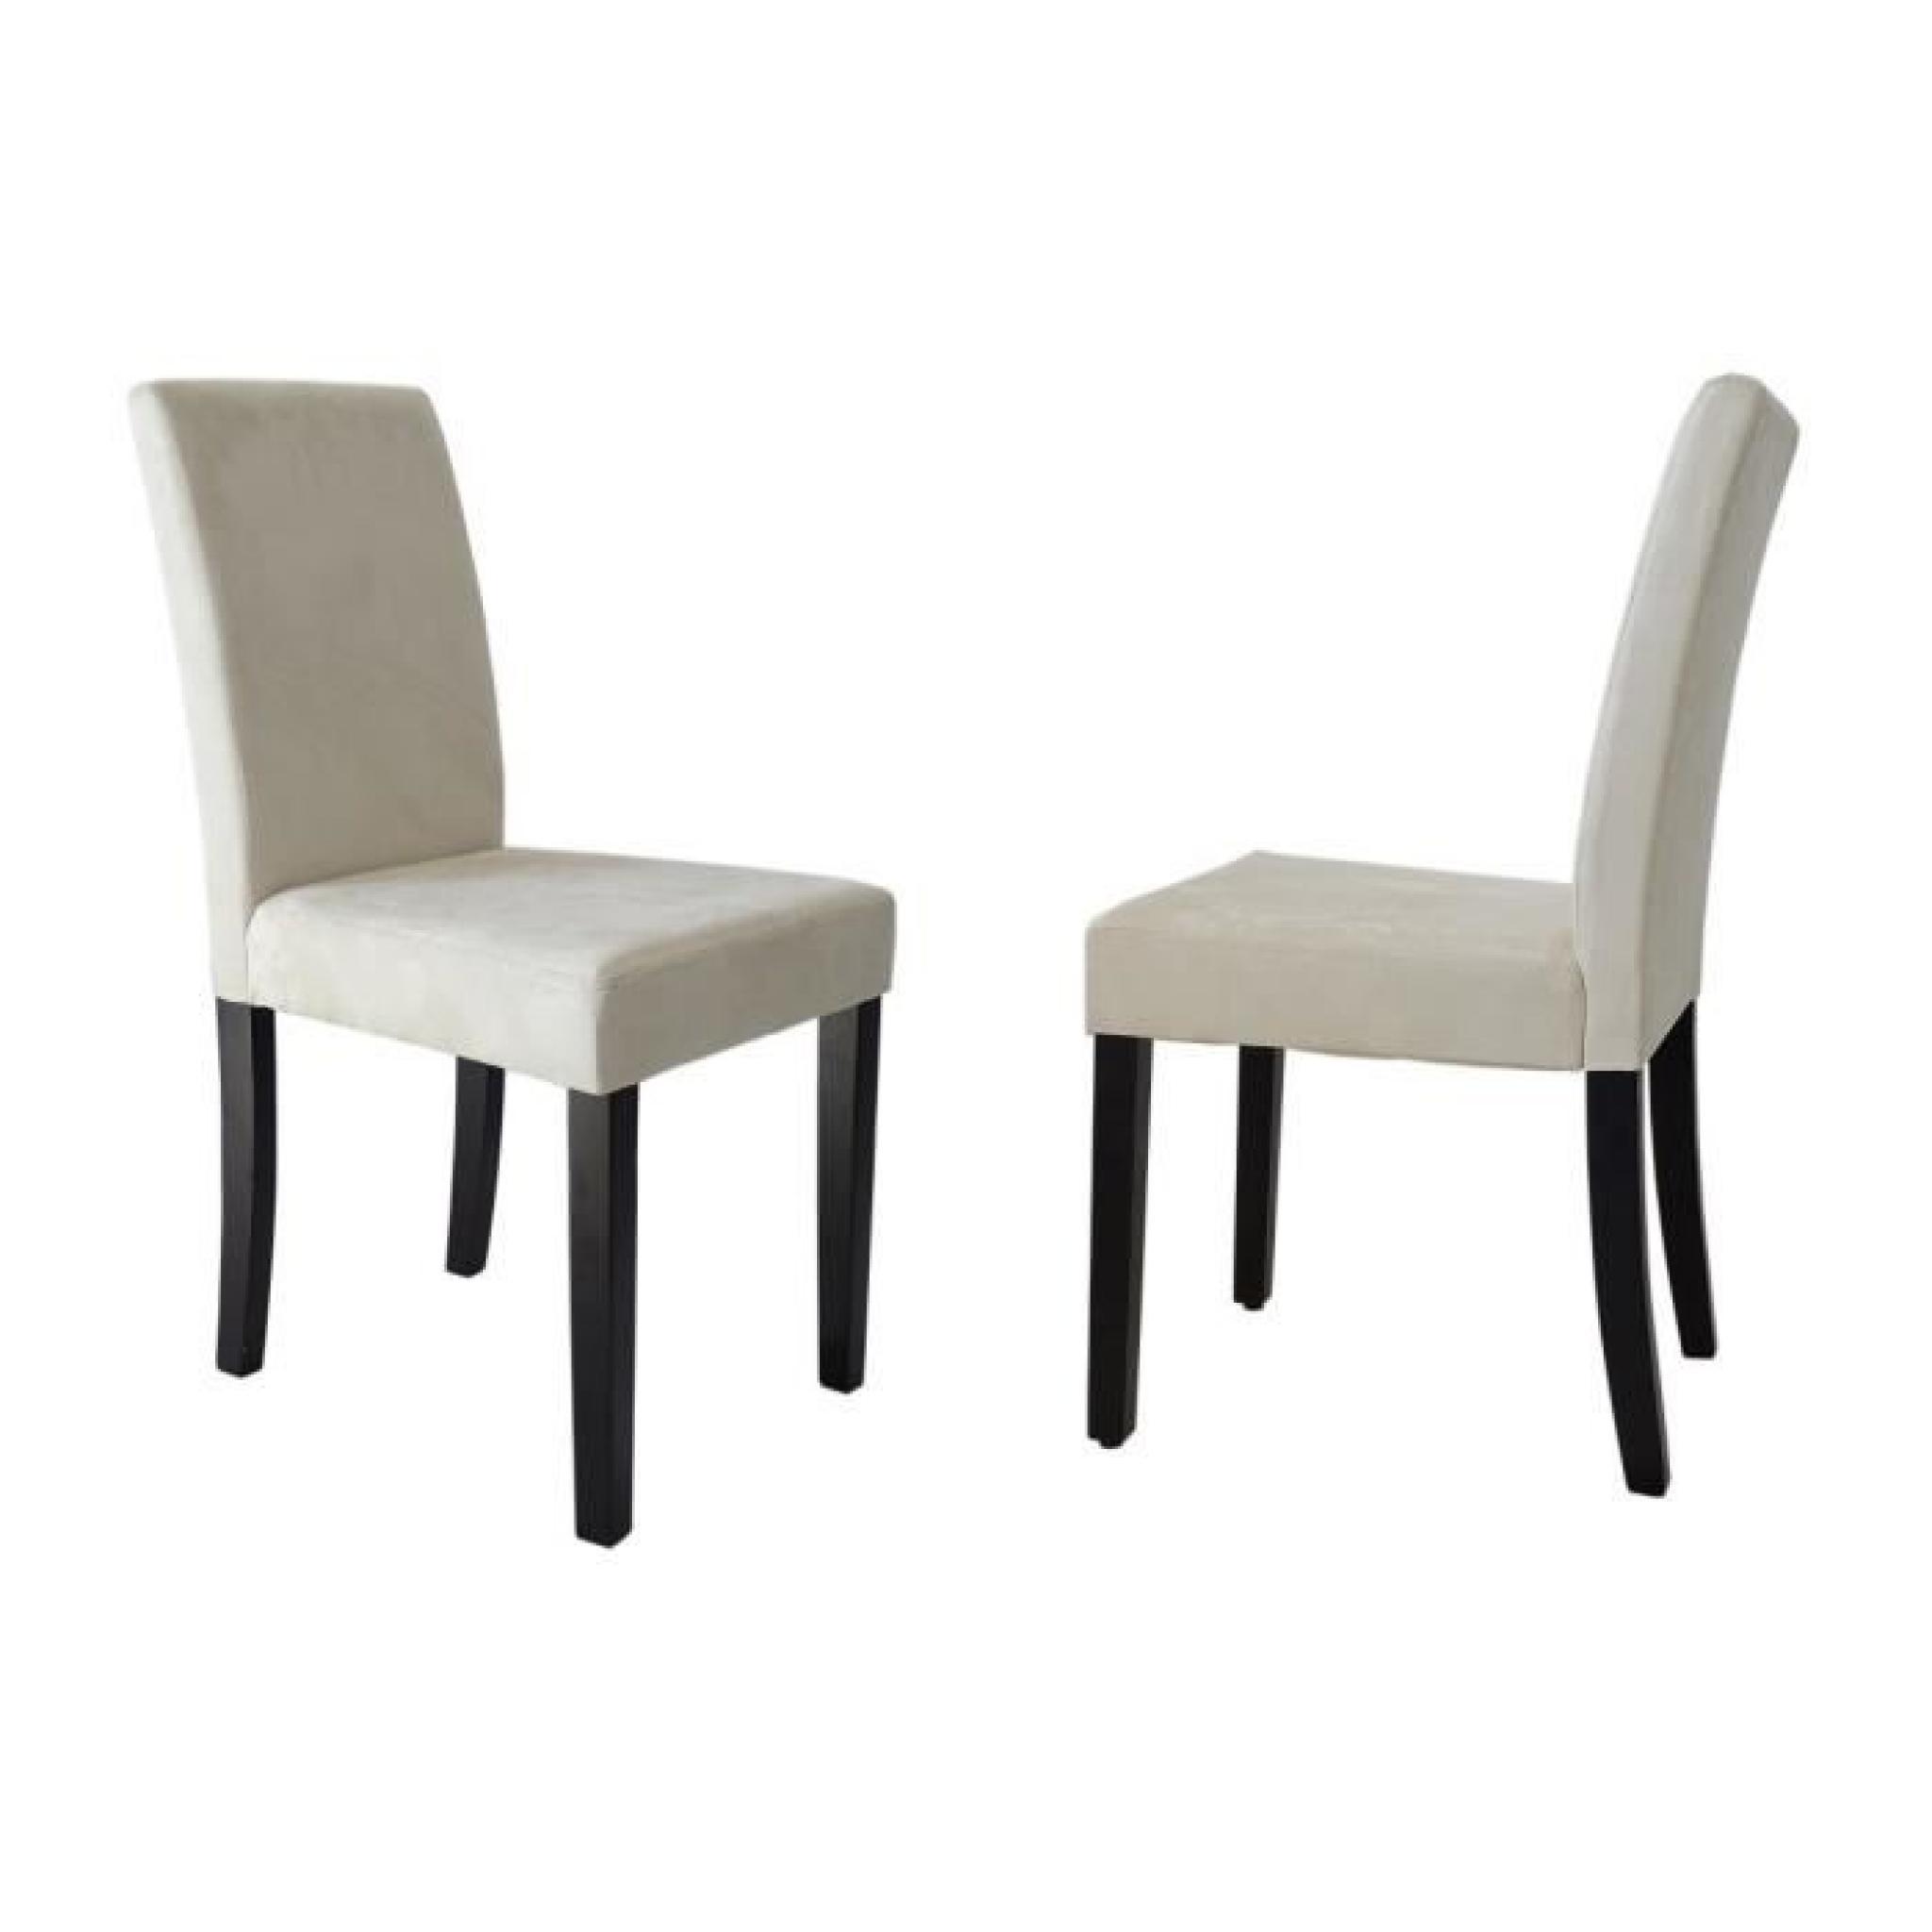 Clara lot de 2 chaises de salle manger en tissu couleur - Lot de 6 chaises de salle a manger pas cher ...